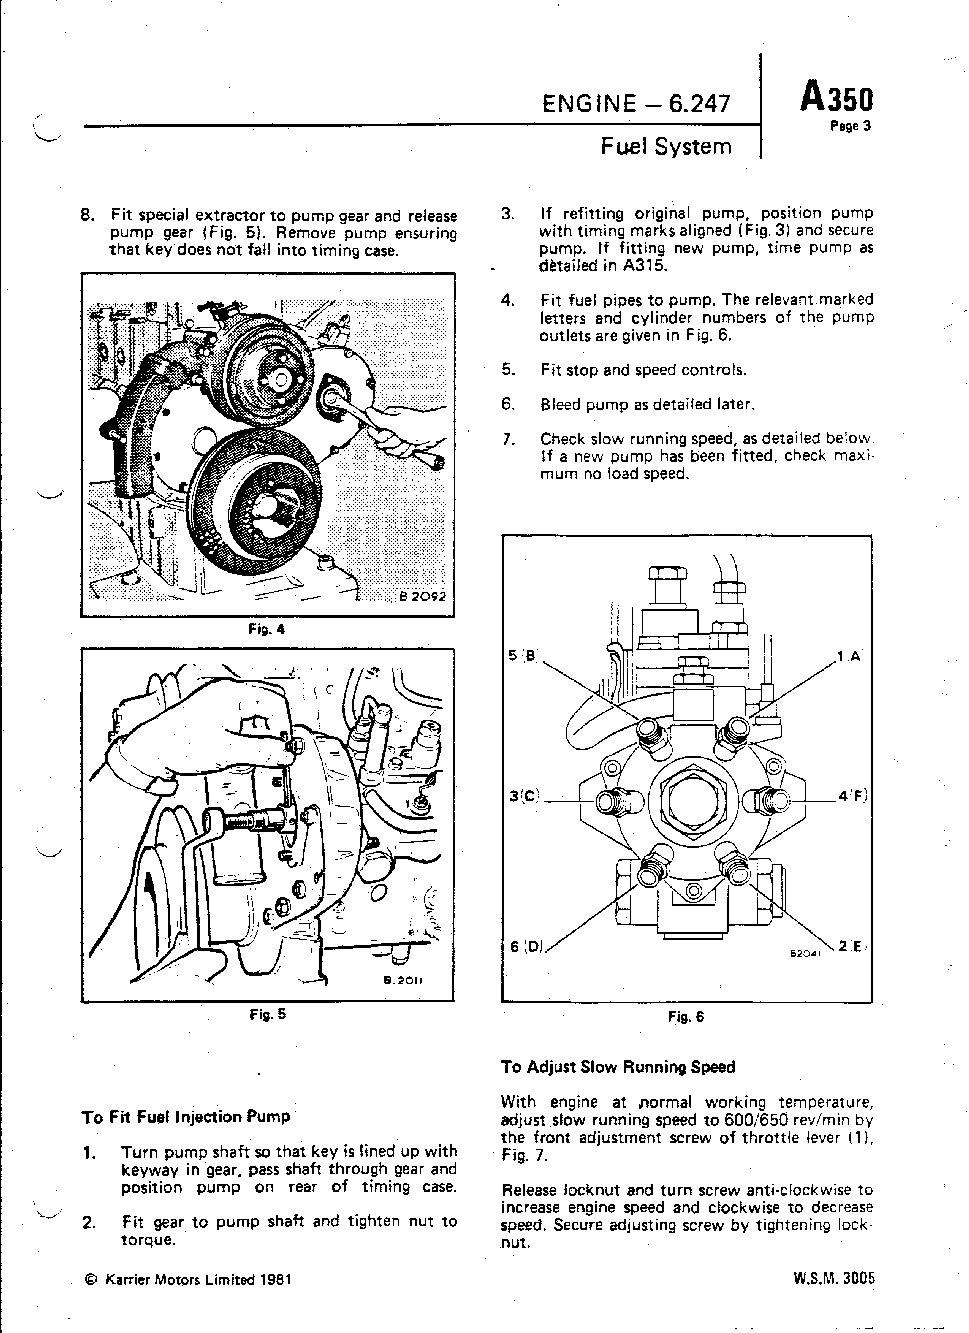 Dodge 50 6.247 Fuel System Index